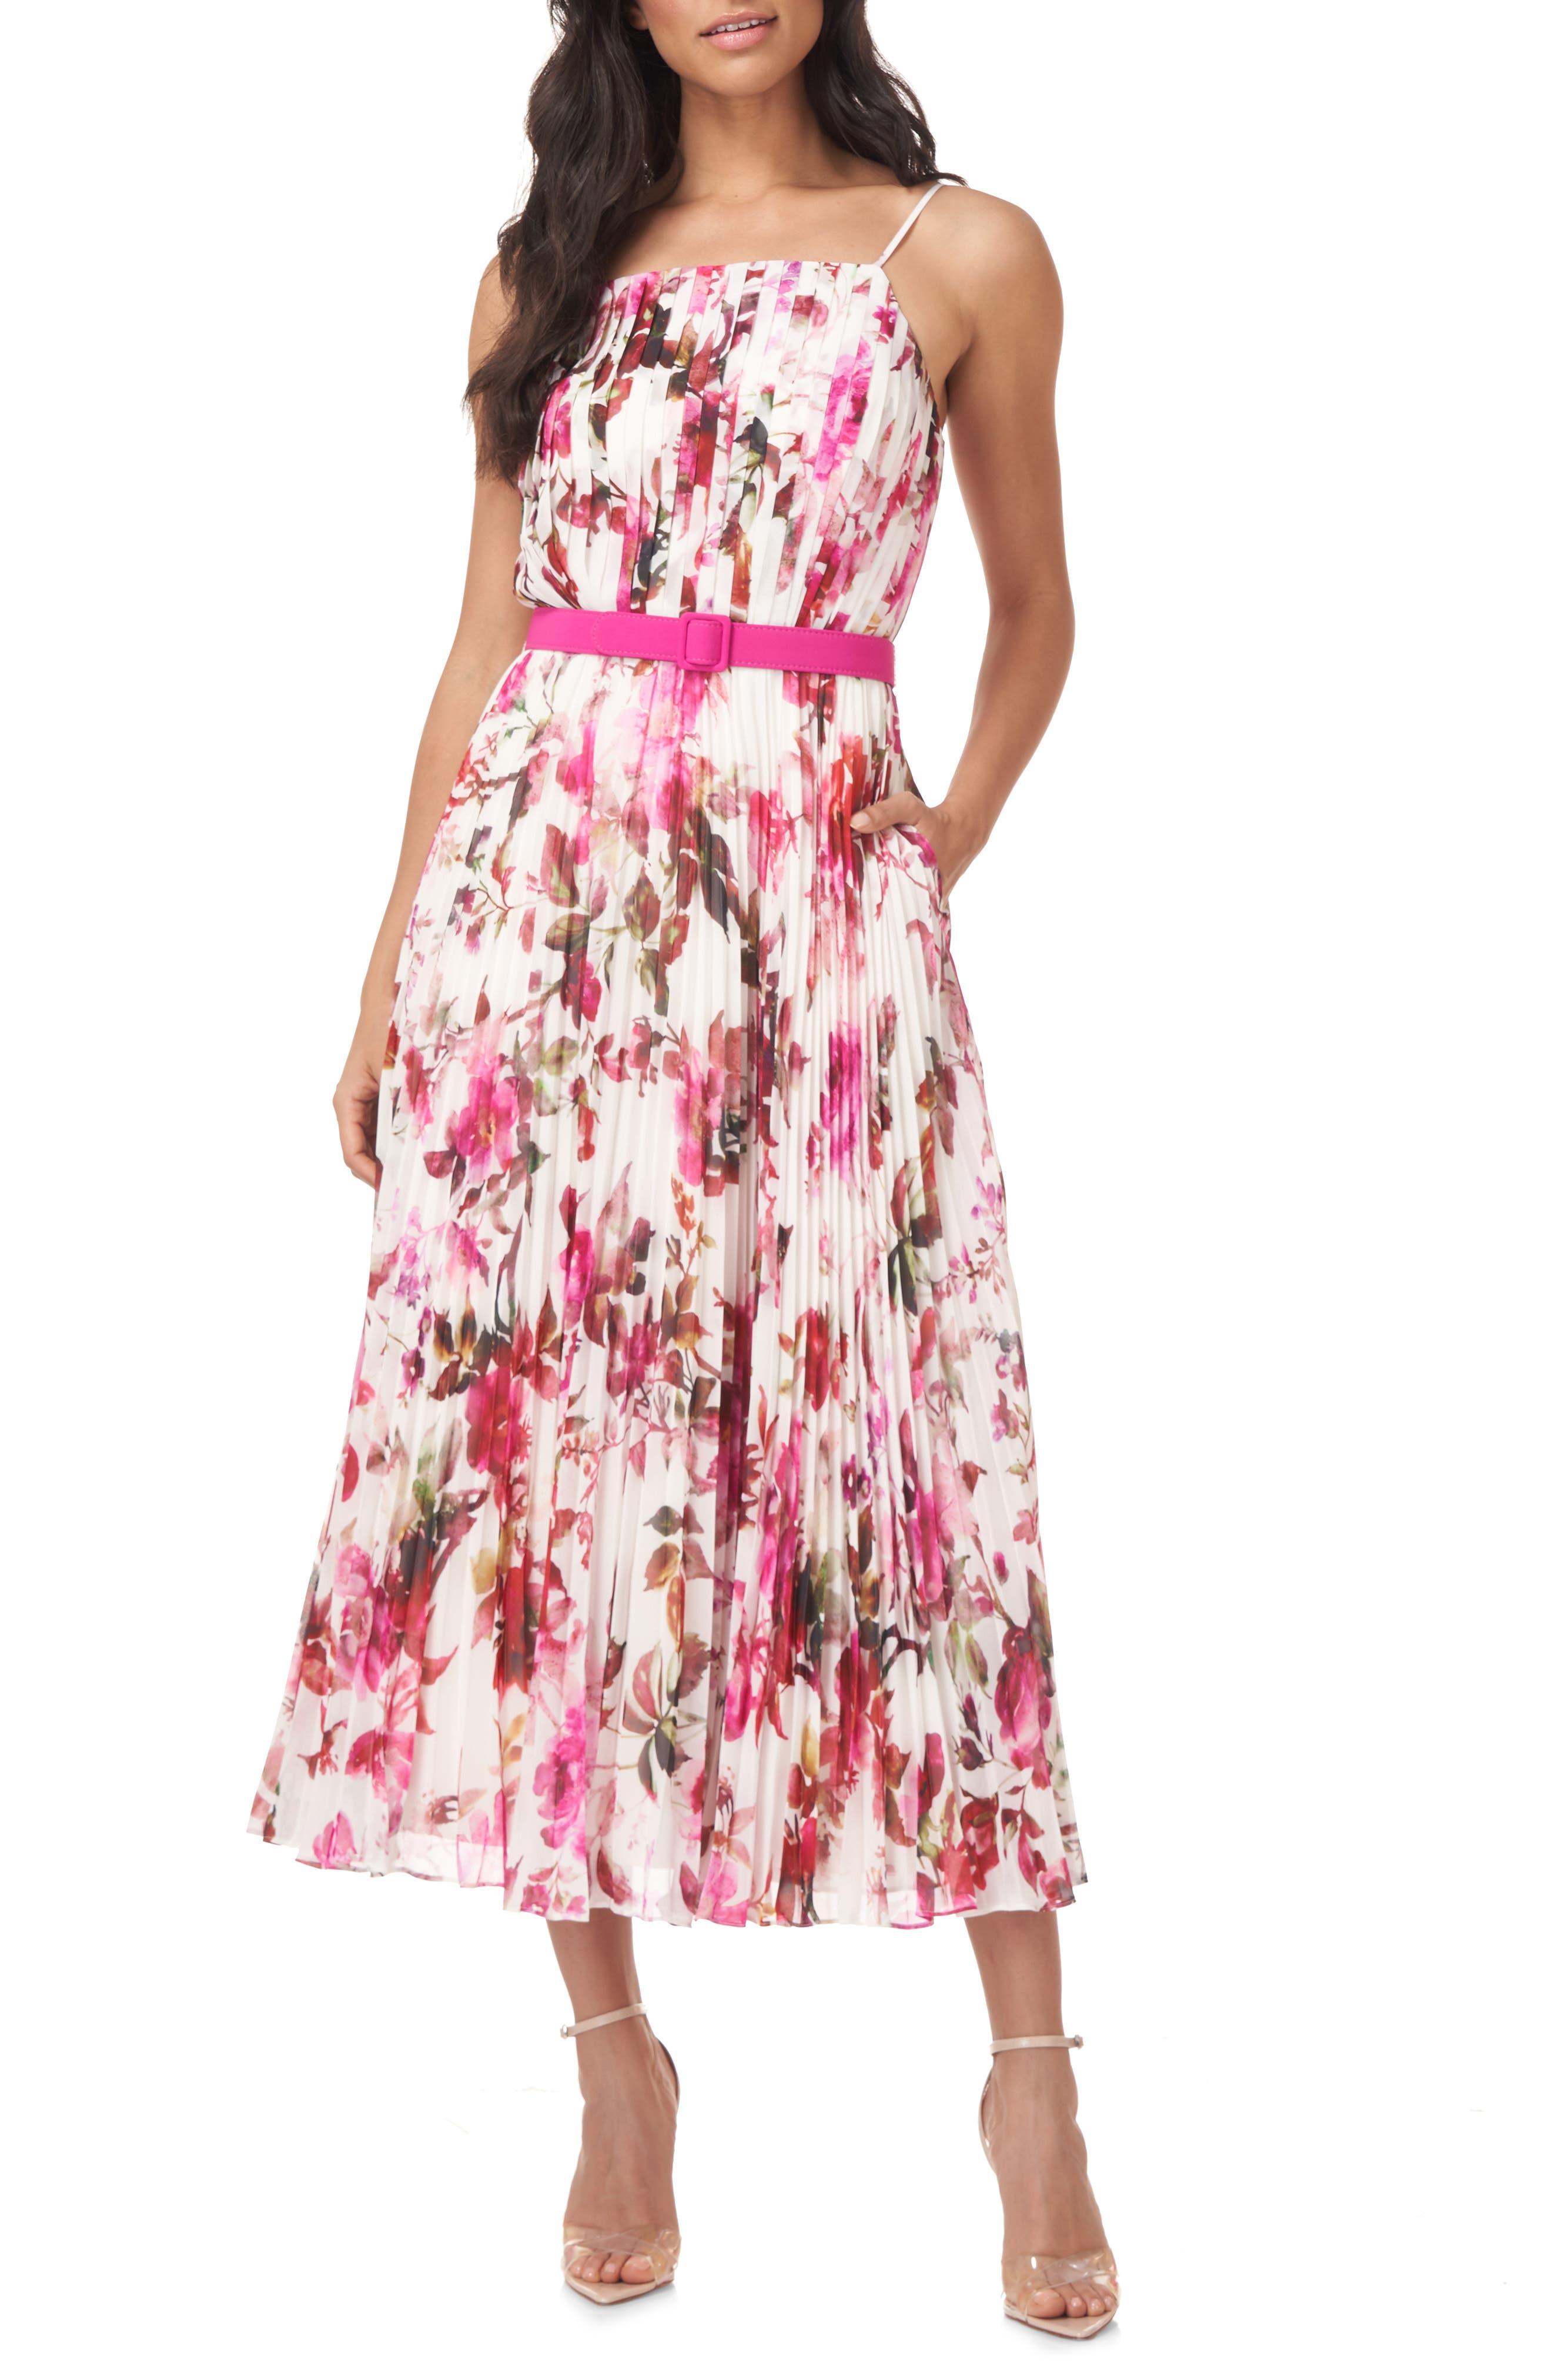 Sia Floral Pleated Midi Dress